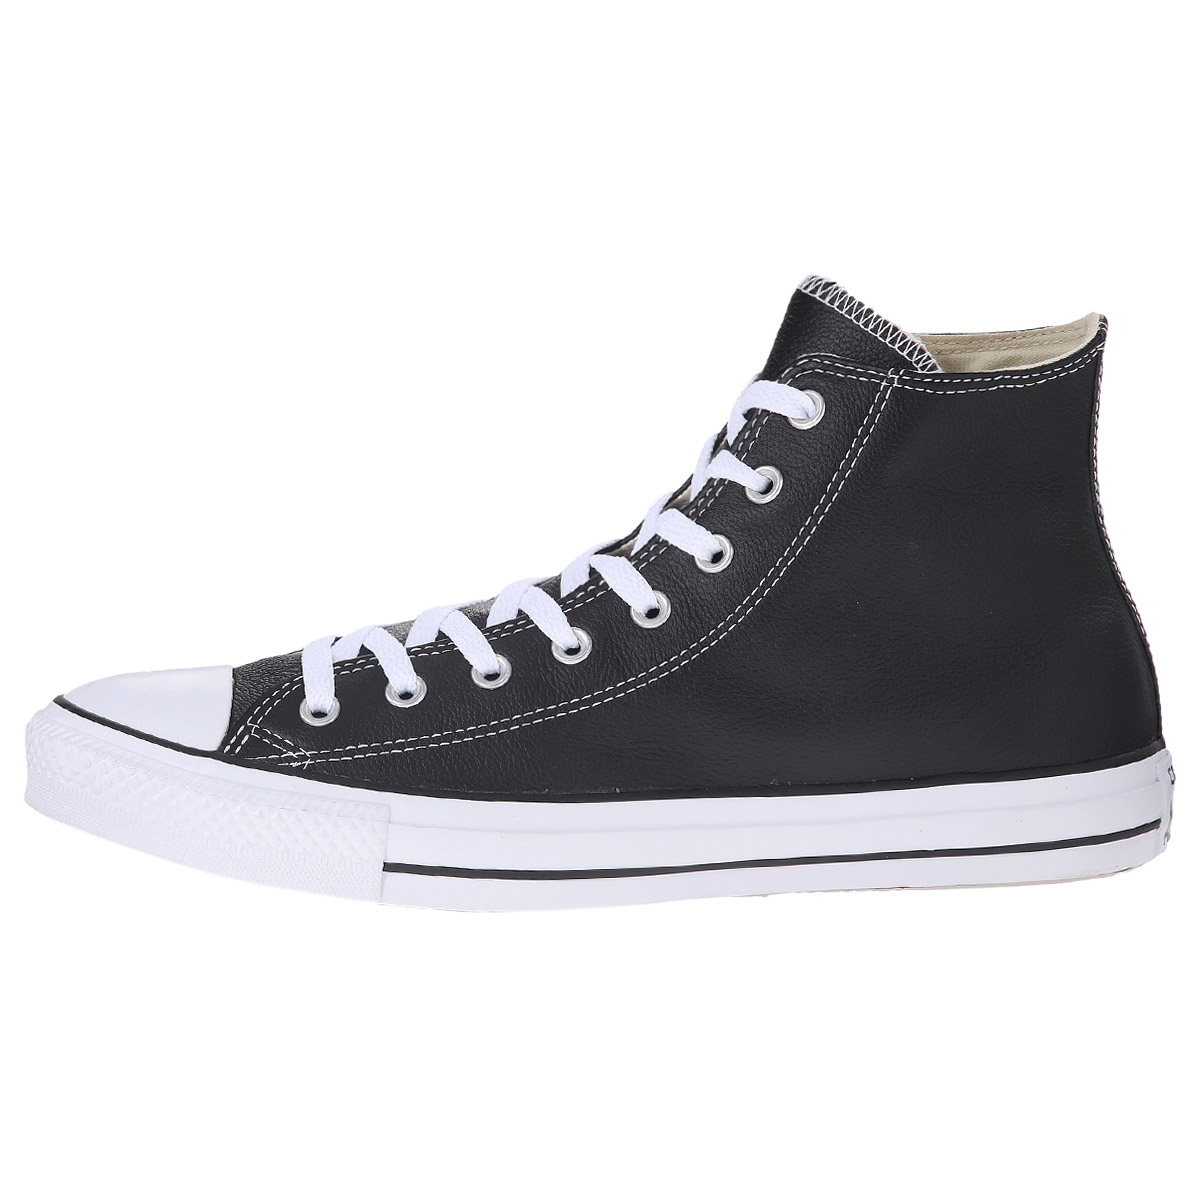 converse chucks hi leather damen schuhe schwarz leder. Black Bedroom Furniture Sets. Home Design Ideas